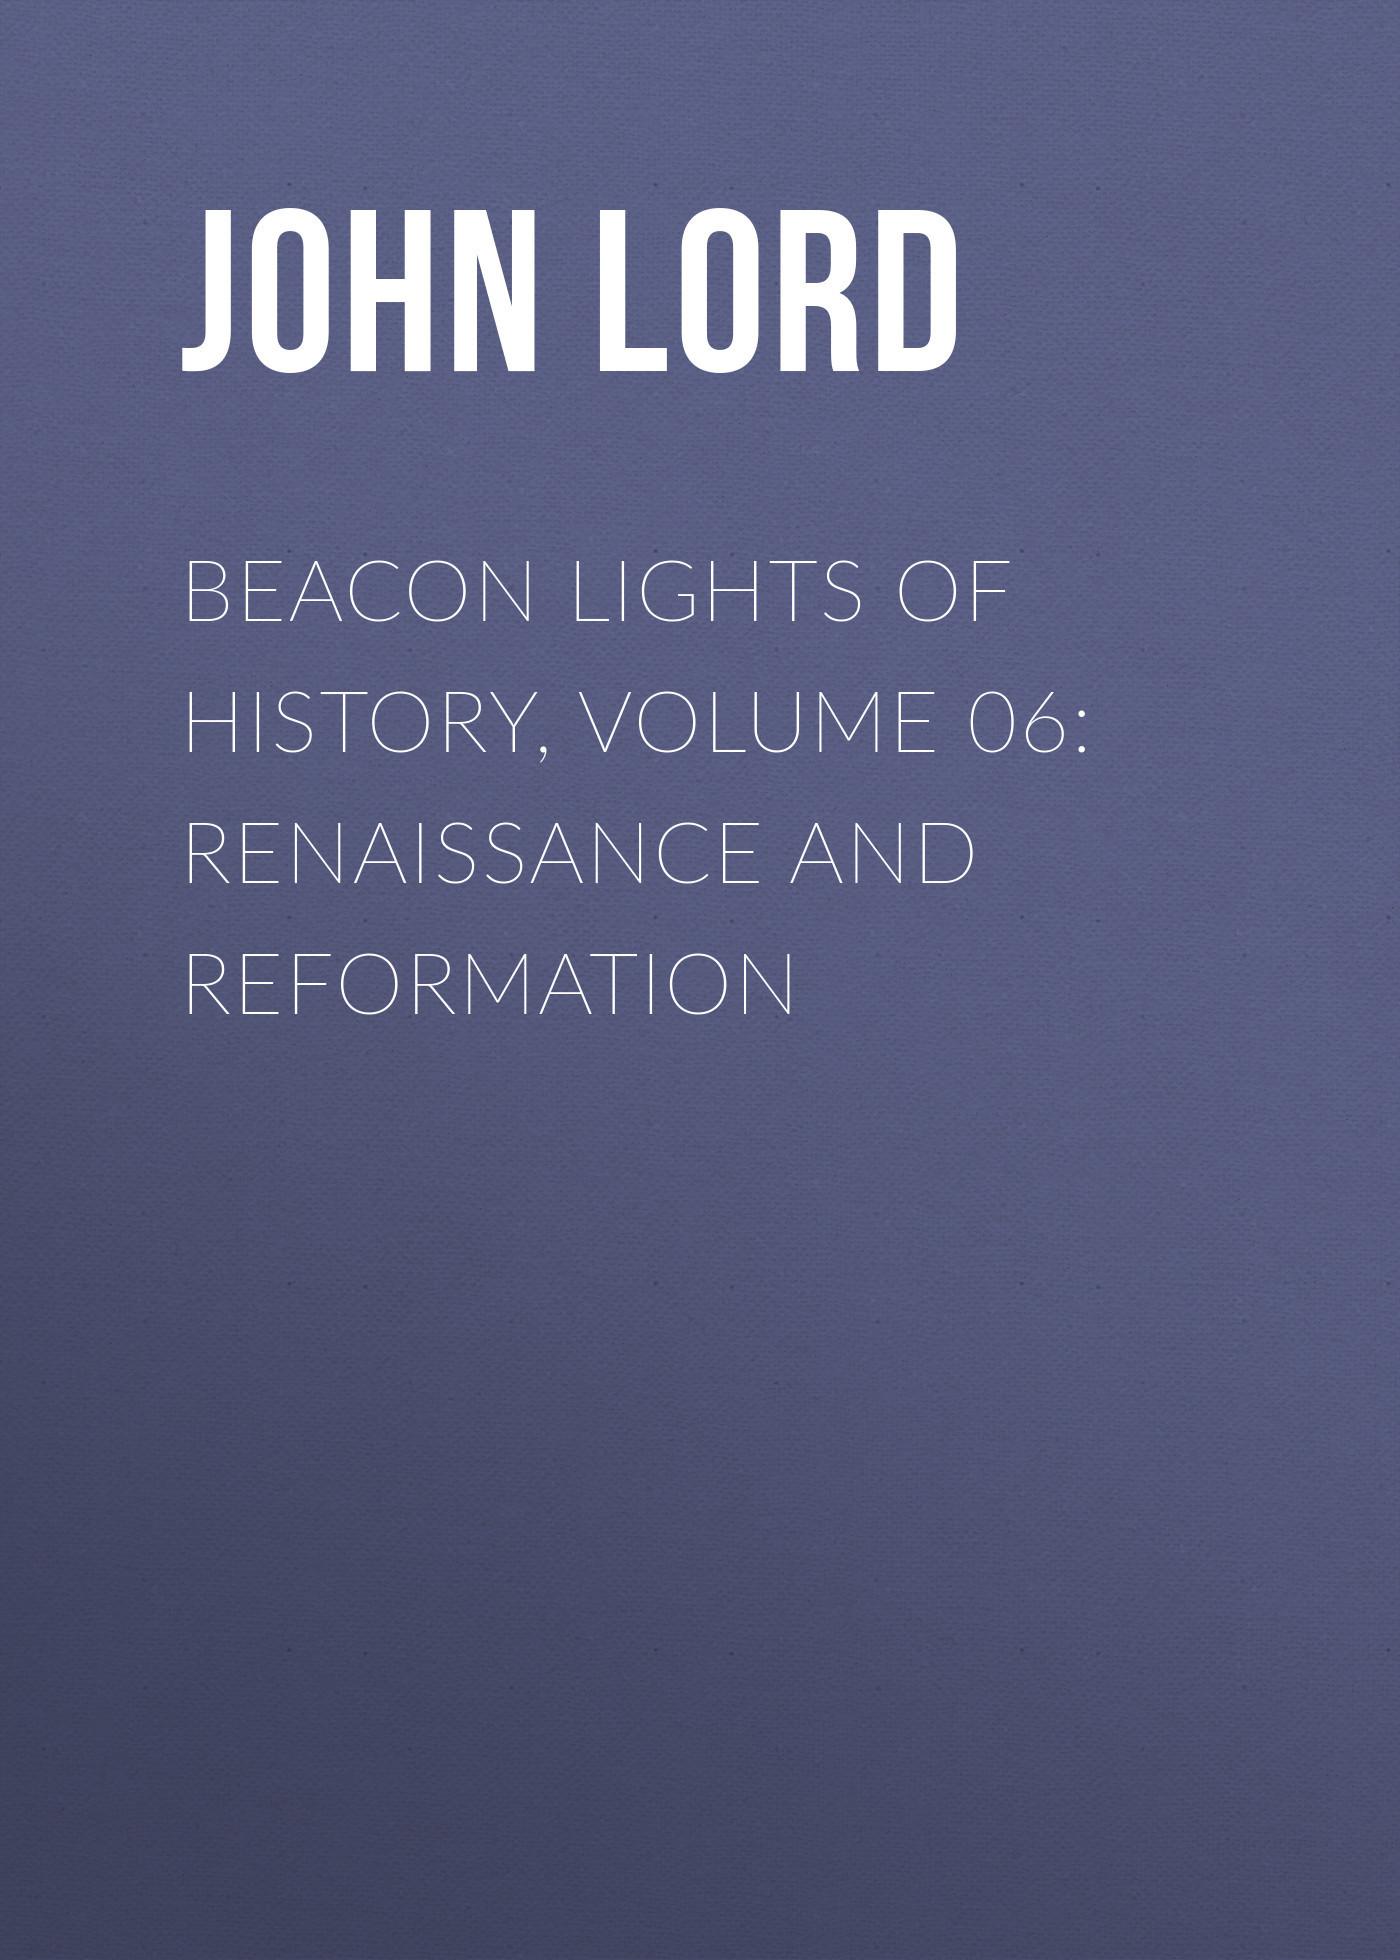 John Lord Beacon Lights of History, Volume 06: Renaissance and Reformation цветкова о ред ремонт и декор стен окраска обои керамическая плитка декоративная отделка